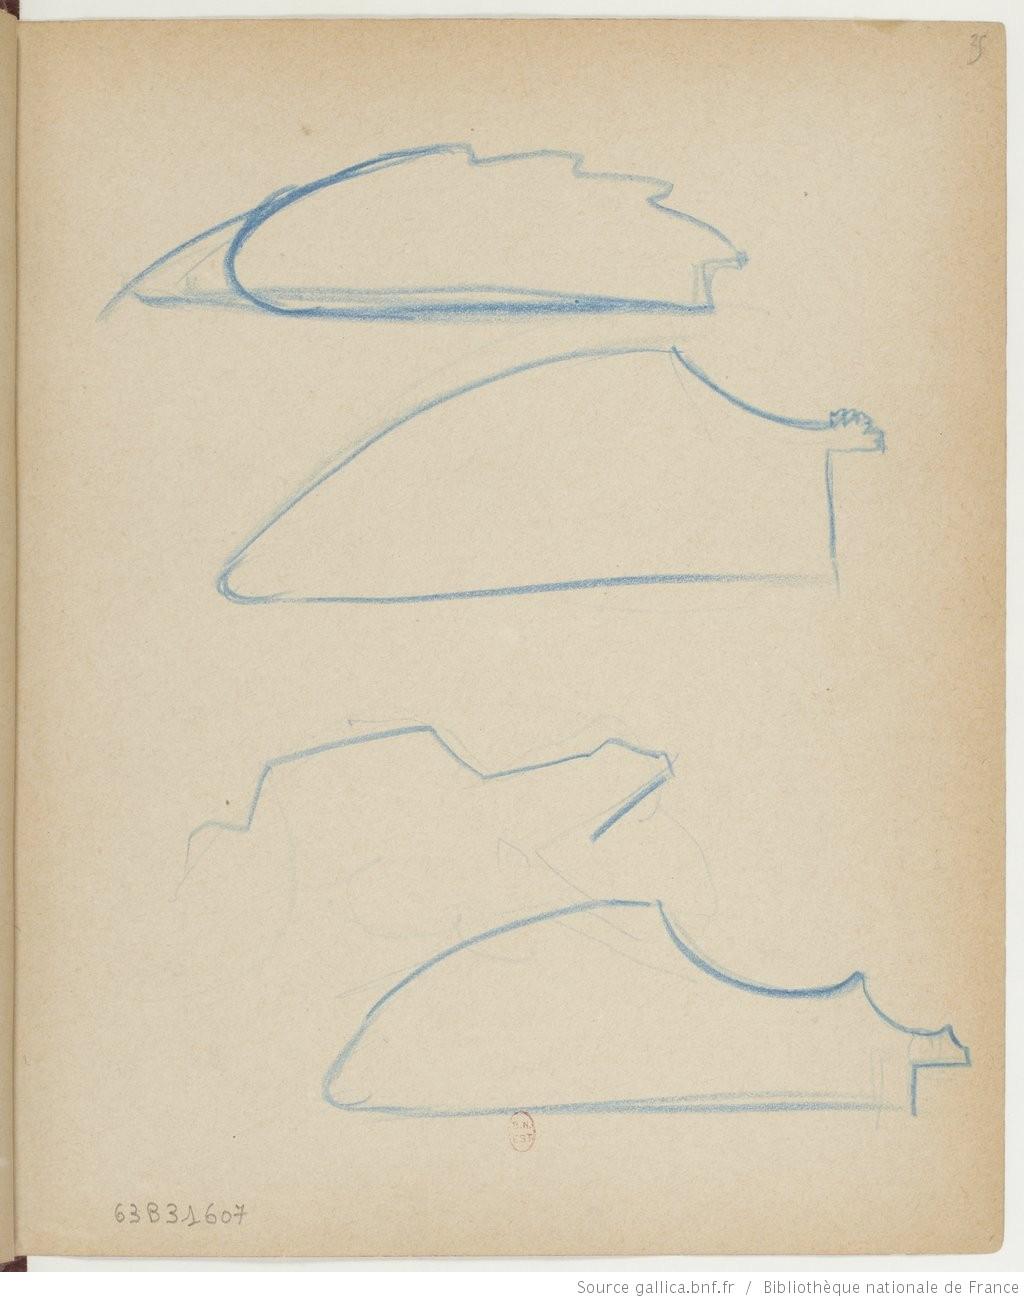 Рис.3 Эдгар Дега,Записная книжка 9, стр.25, 1877-83.